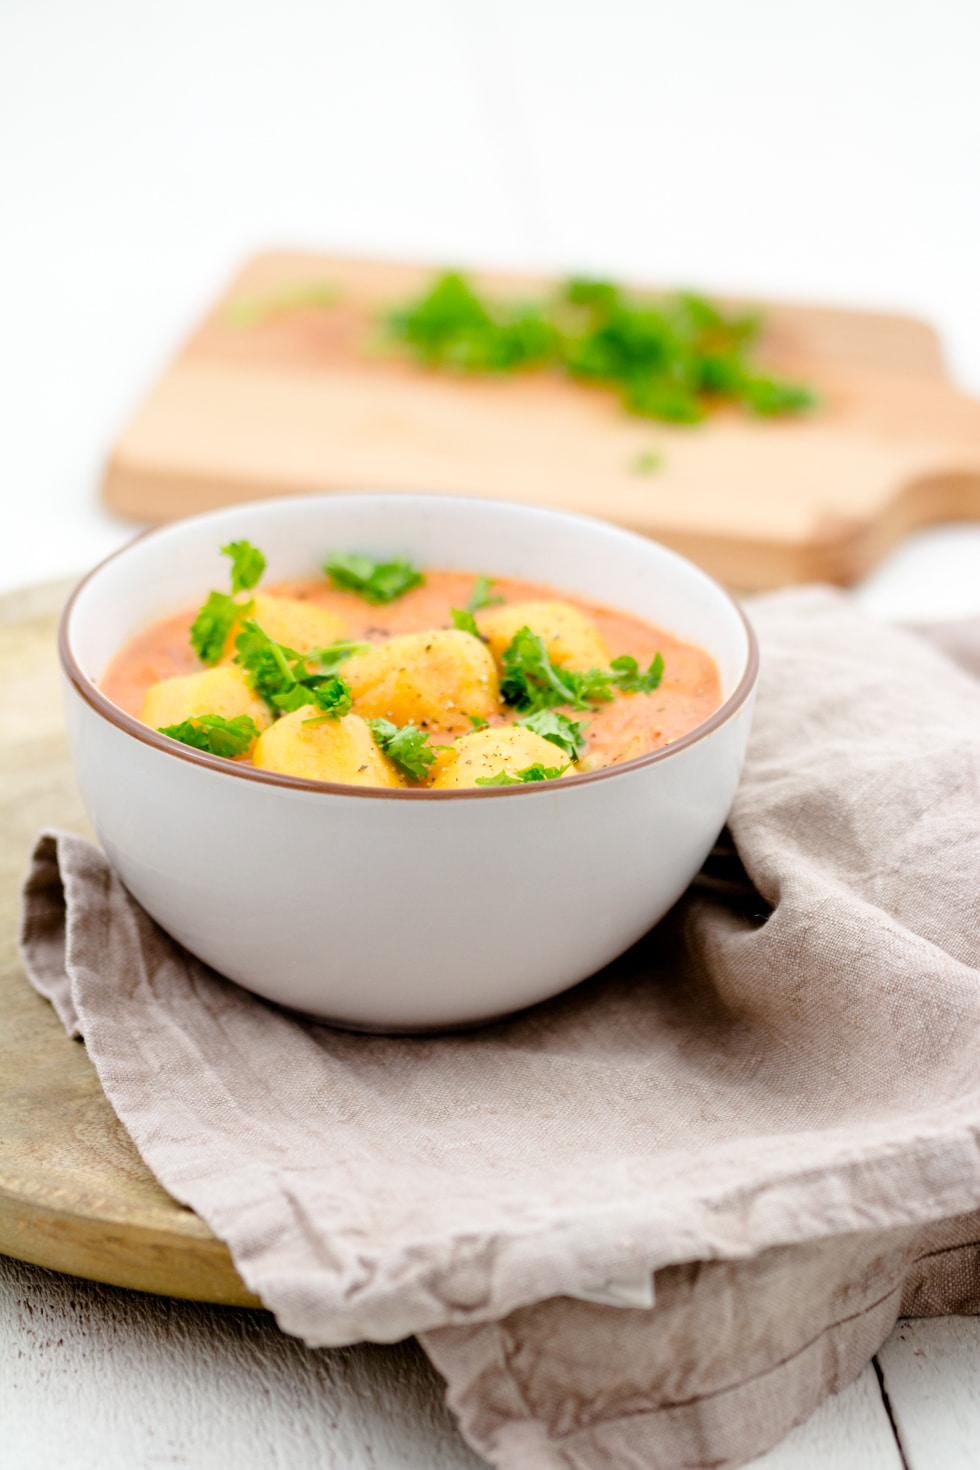 Süßkartoffelkloesse-Kokos-Tomaten-Sauce-Springlane-2